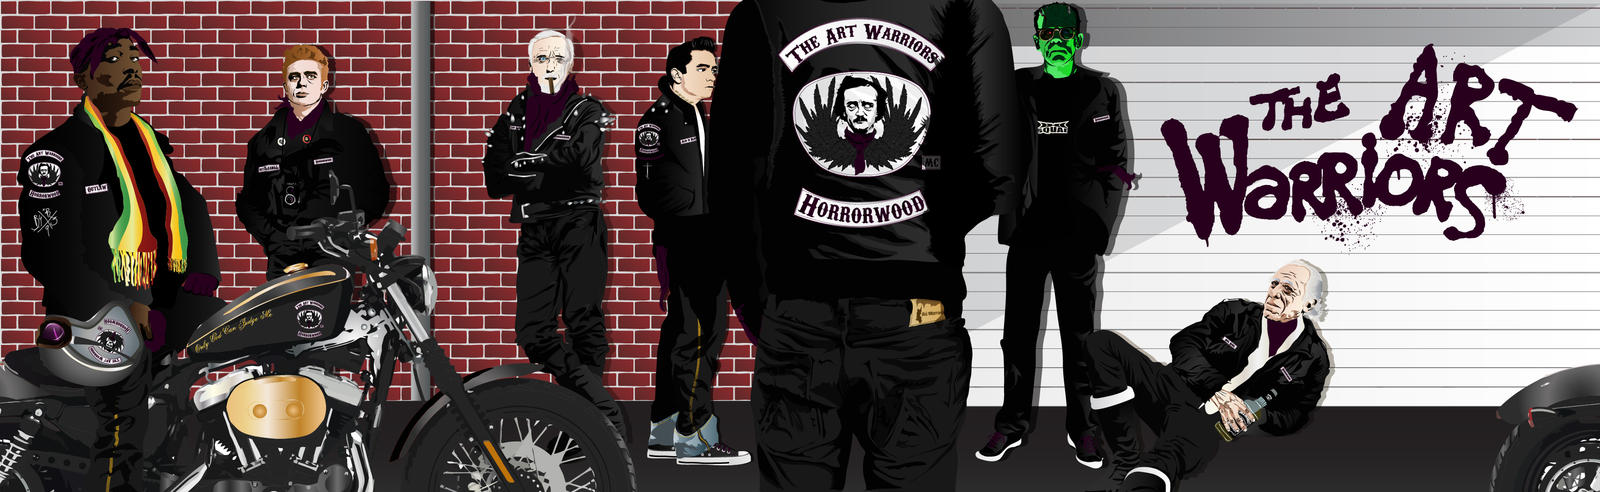 Art Warriors Motorcycle Club by artwarriors